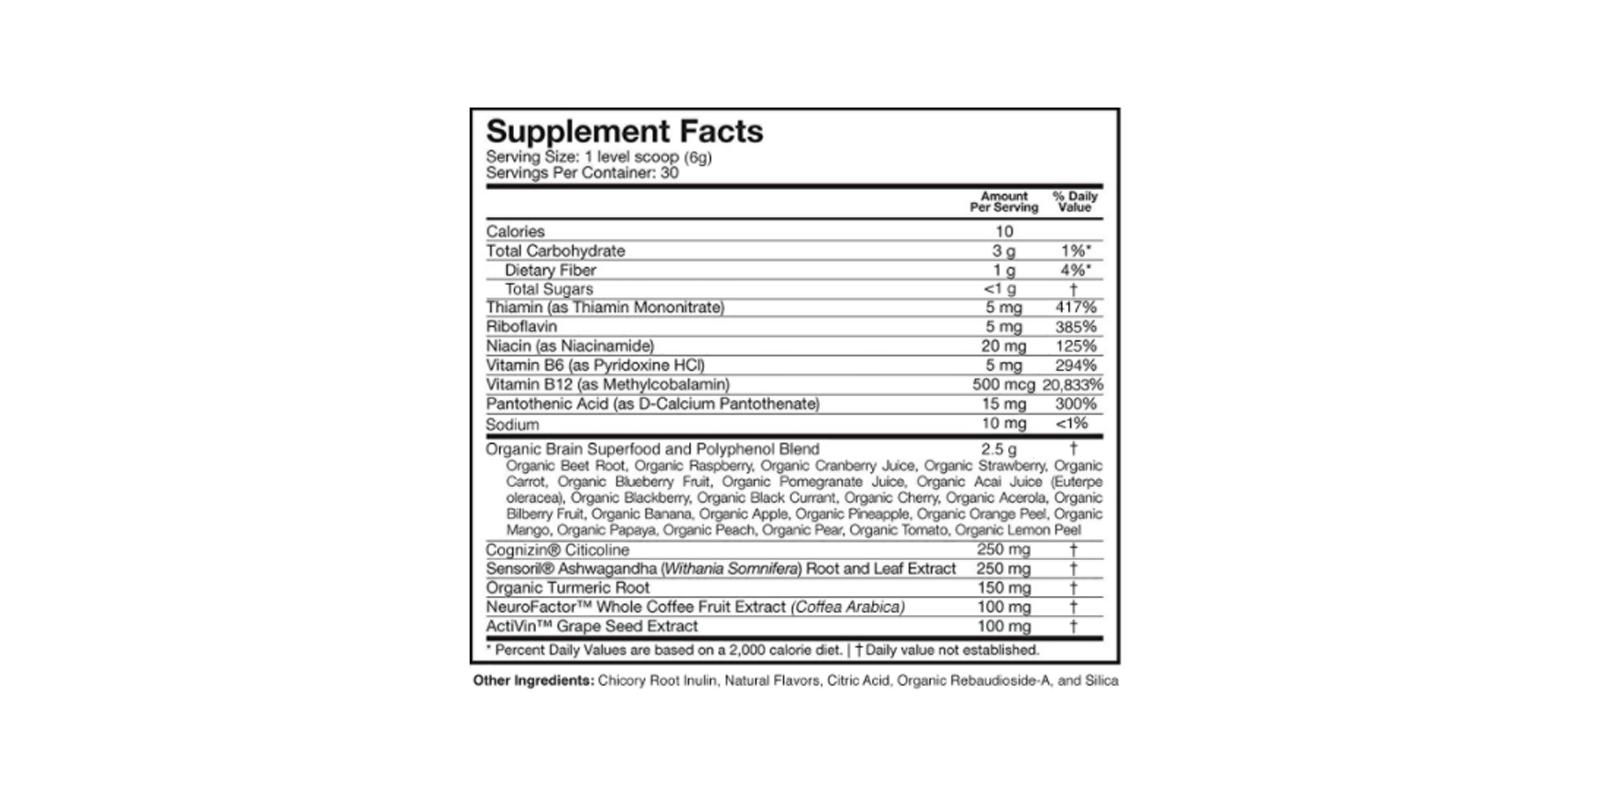 Neuroactiv6 dosage